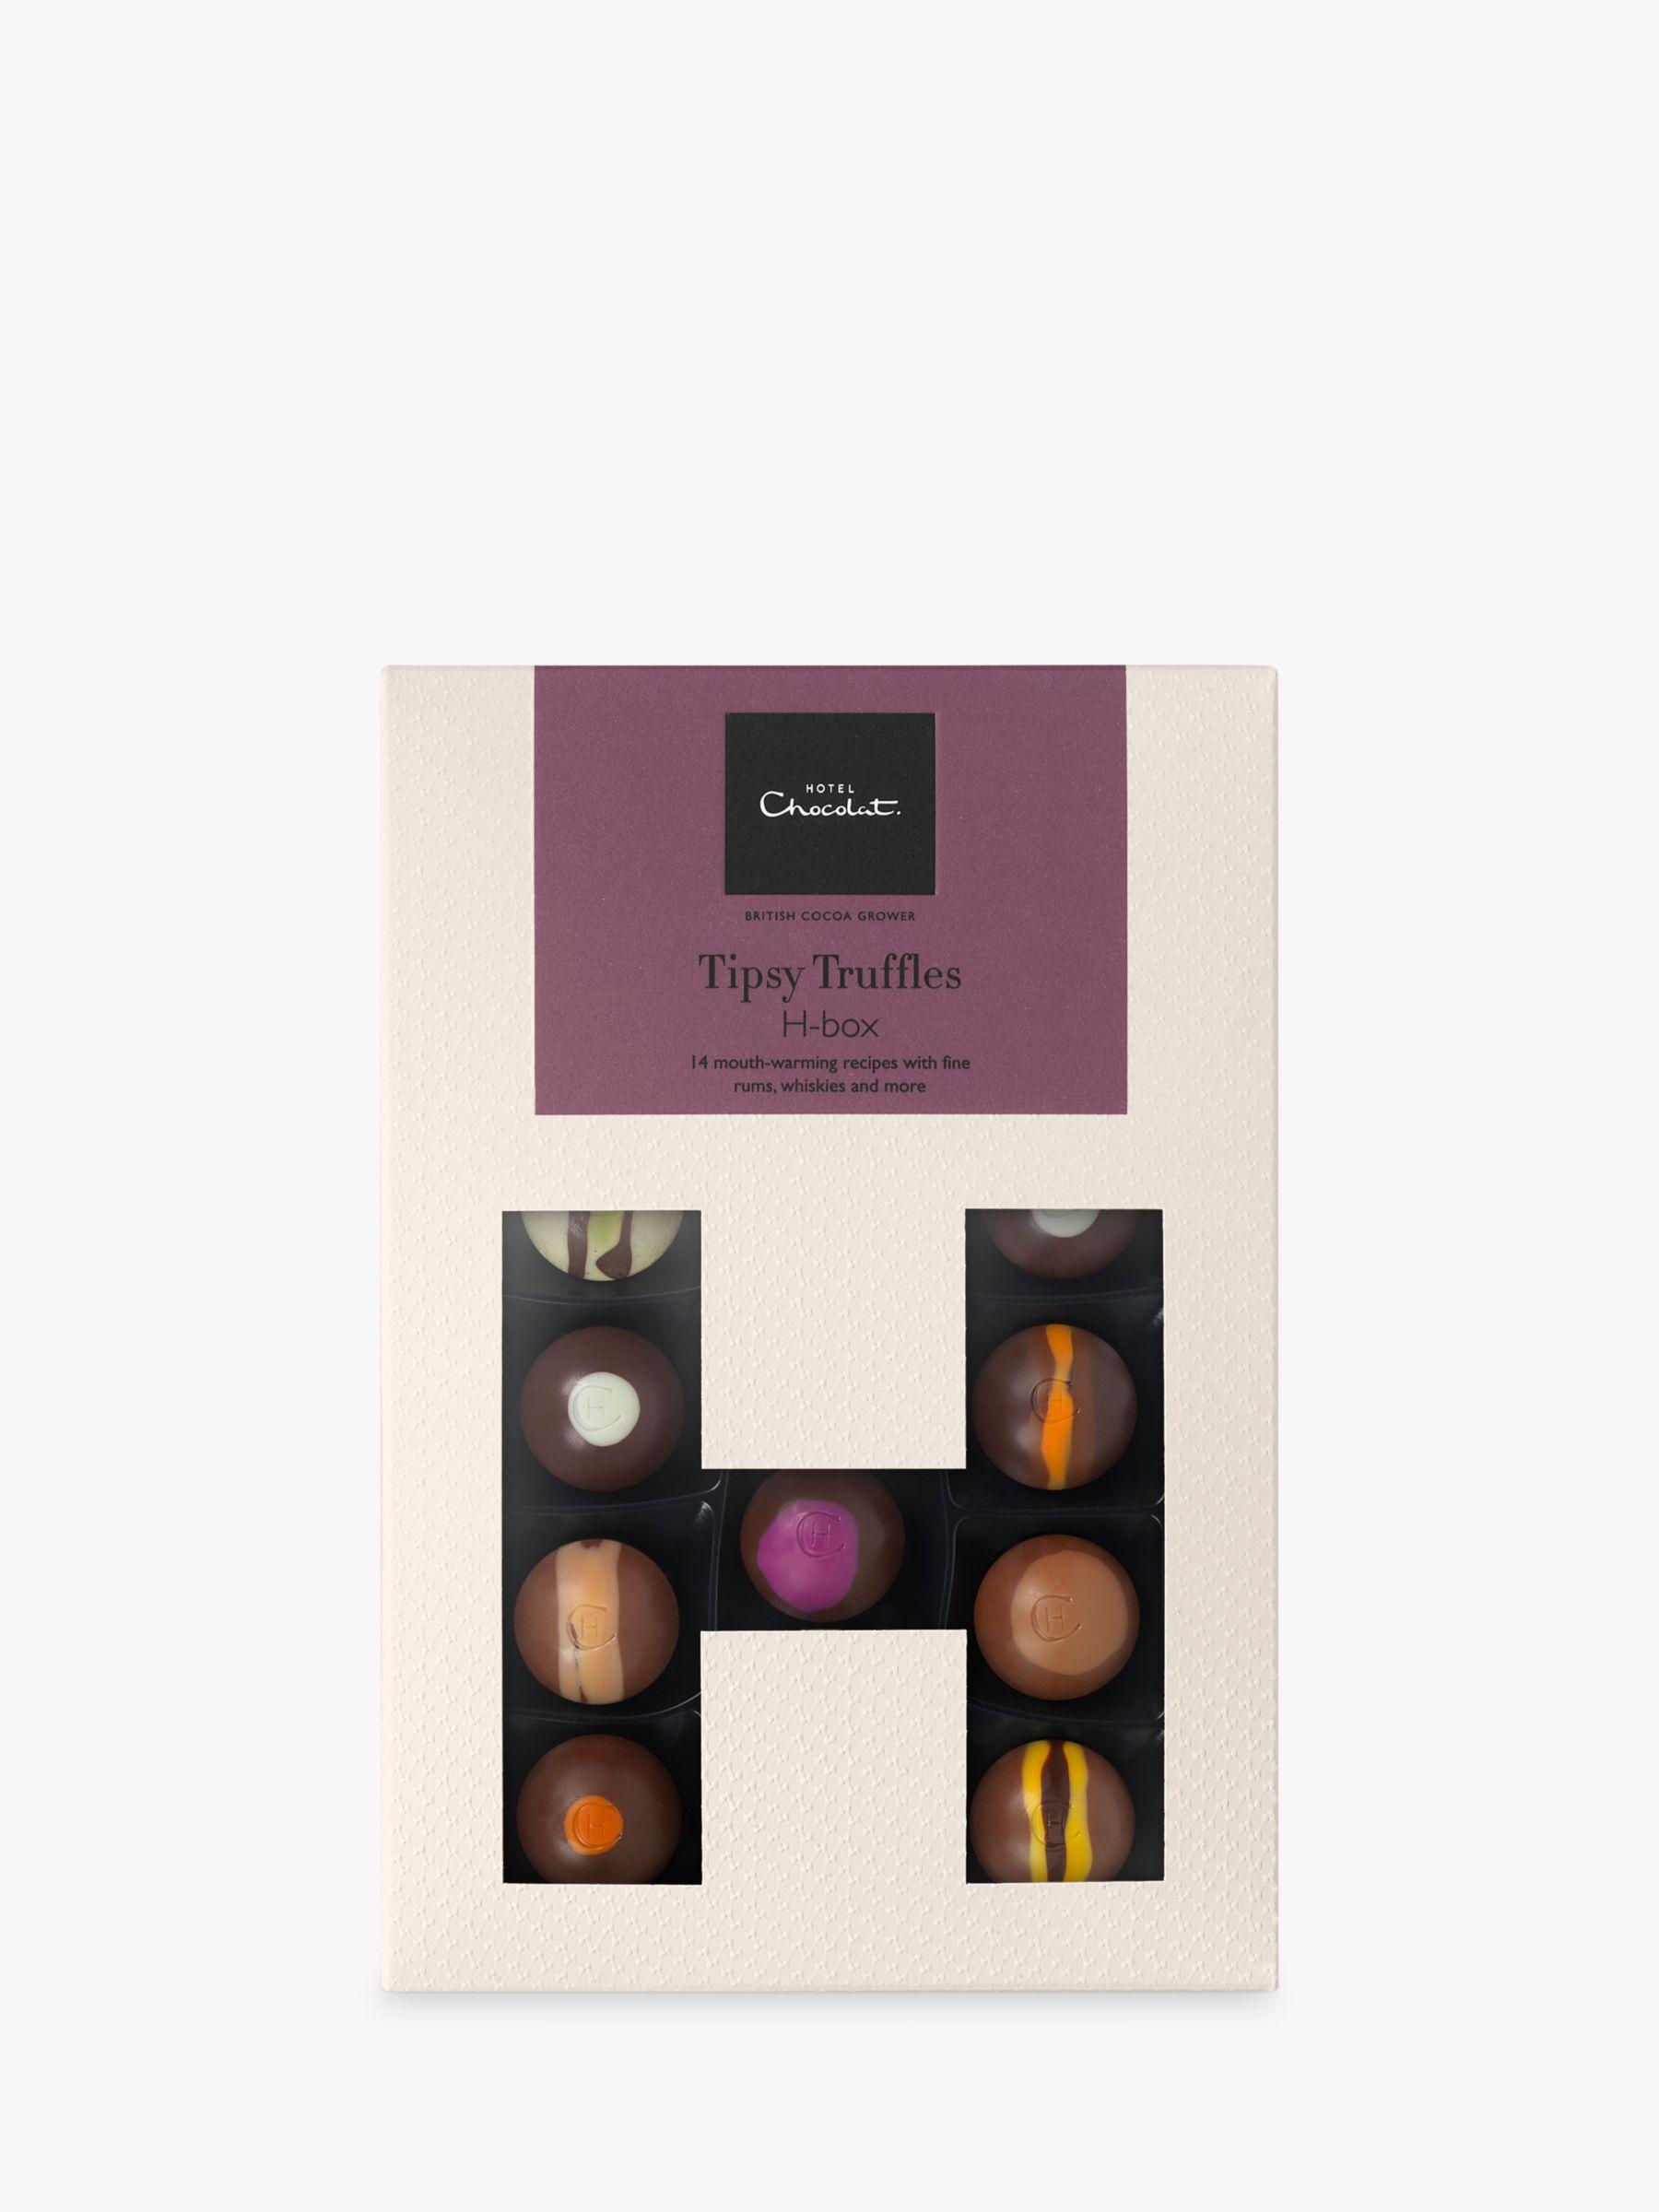 Hotel Chocolat Hotel Chocolat Tipsy Truffles Hbox, Box of 14, 150g